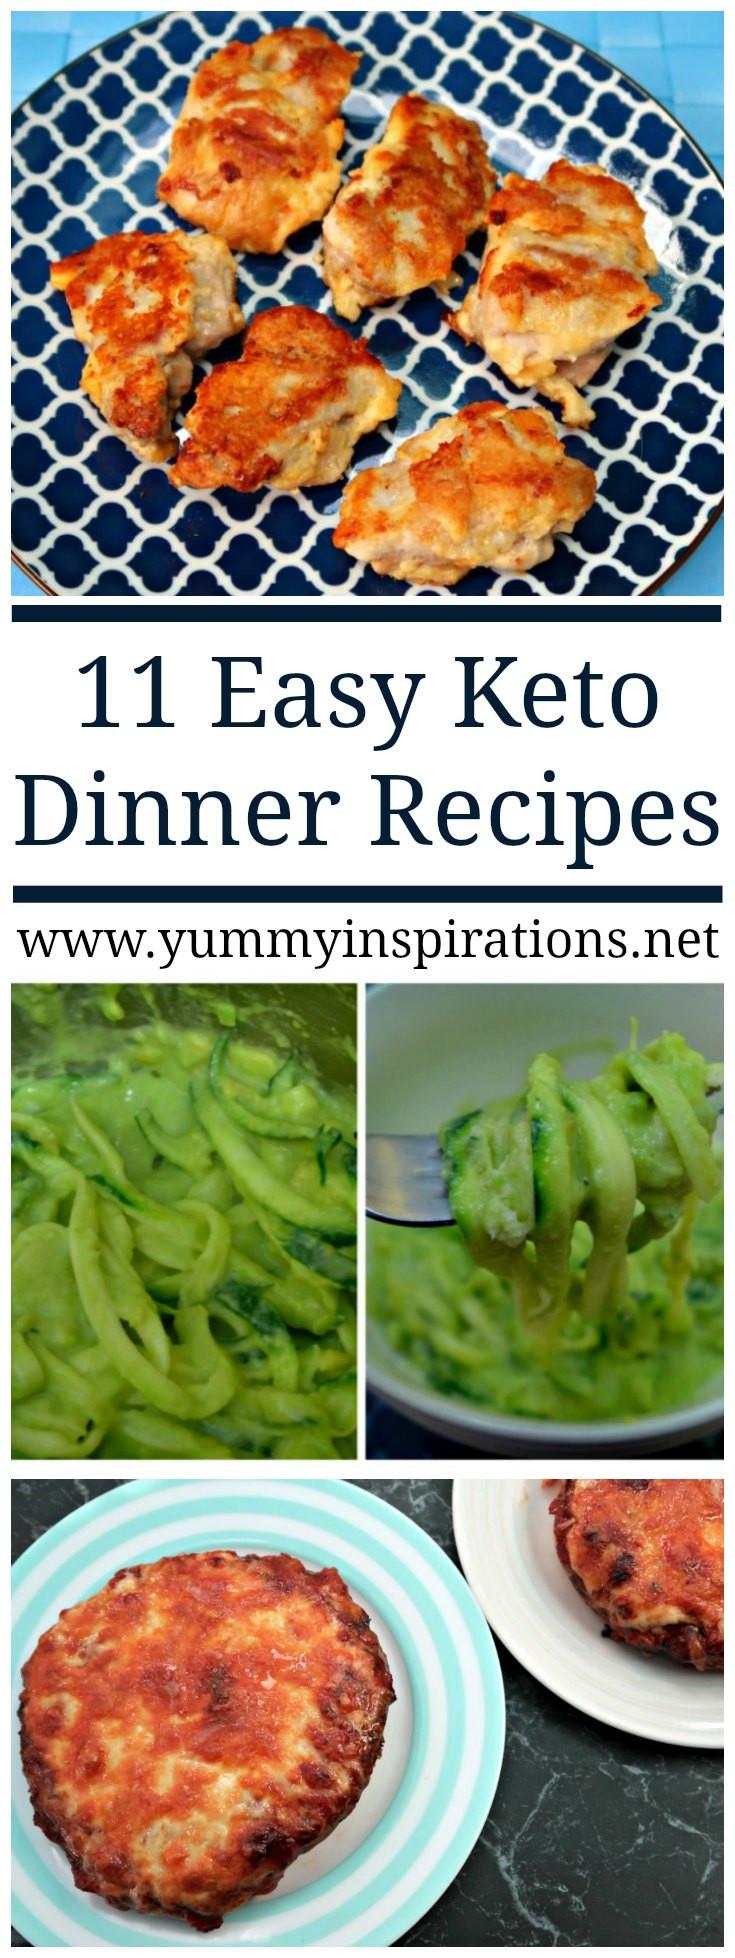 Keto Diet Dinner Ideas  11 Easy Keto Dinner Recipes Quick Low Carb Ketogenic